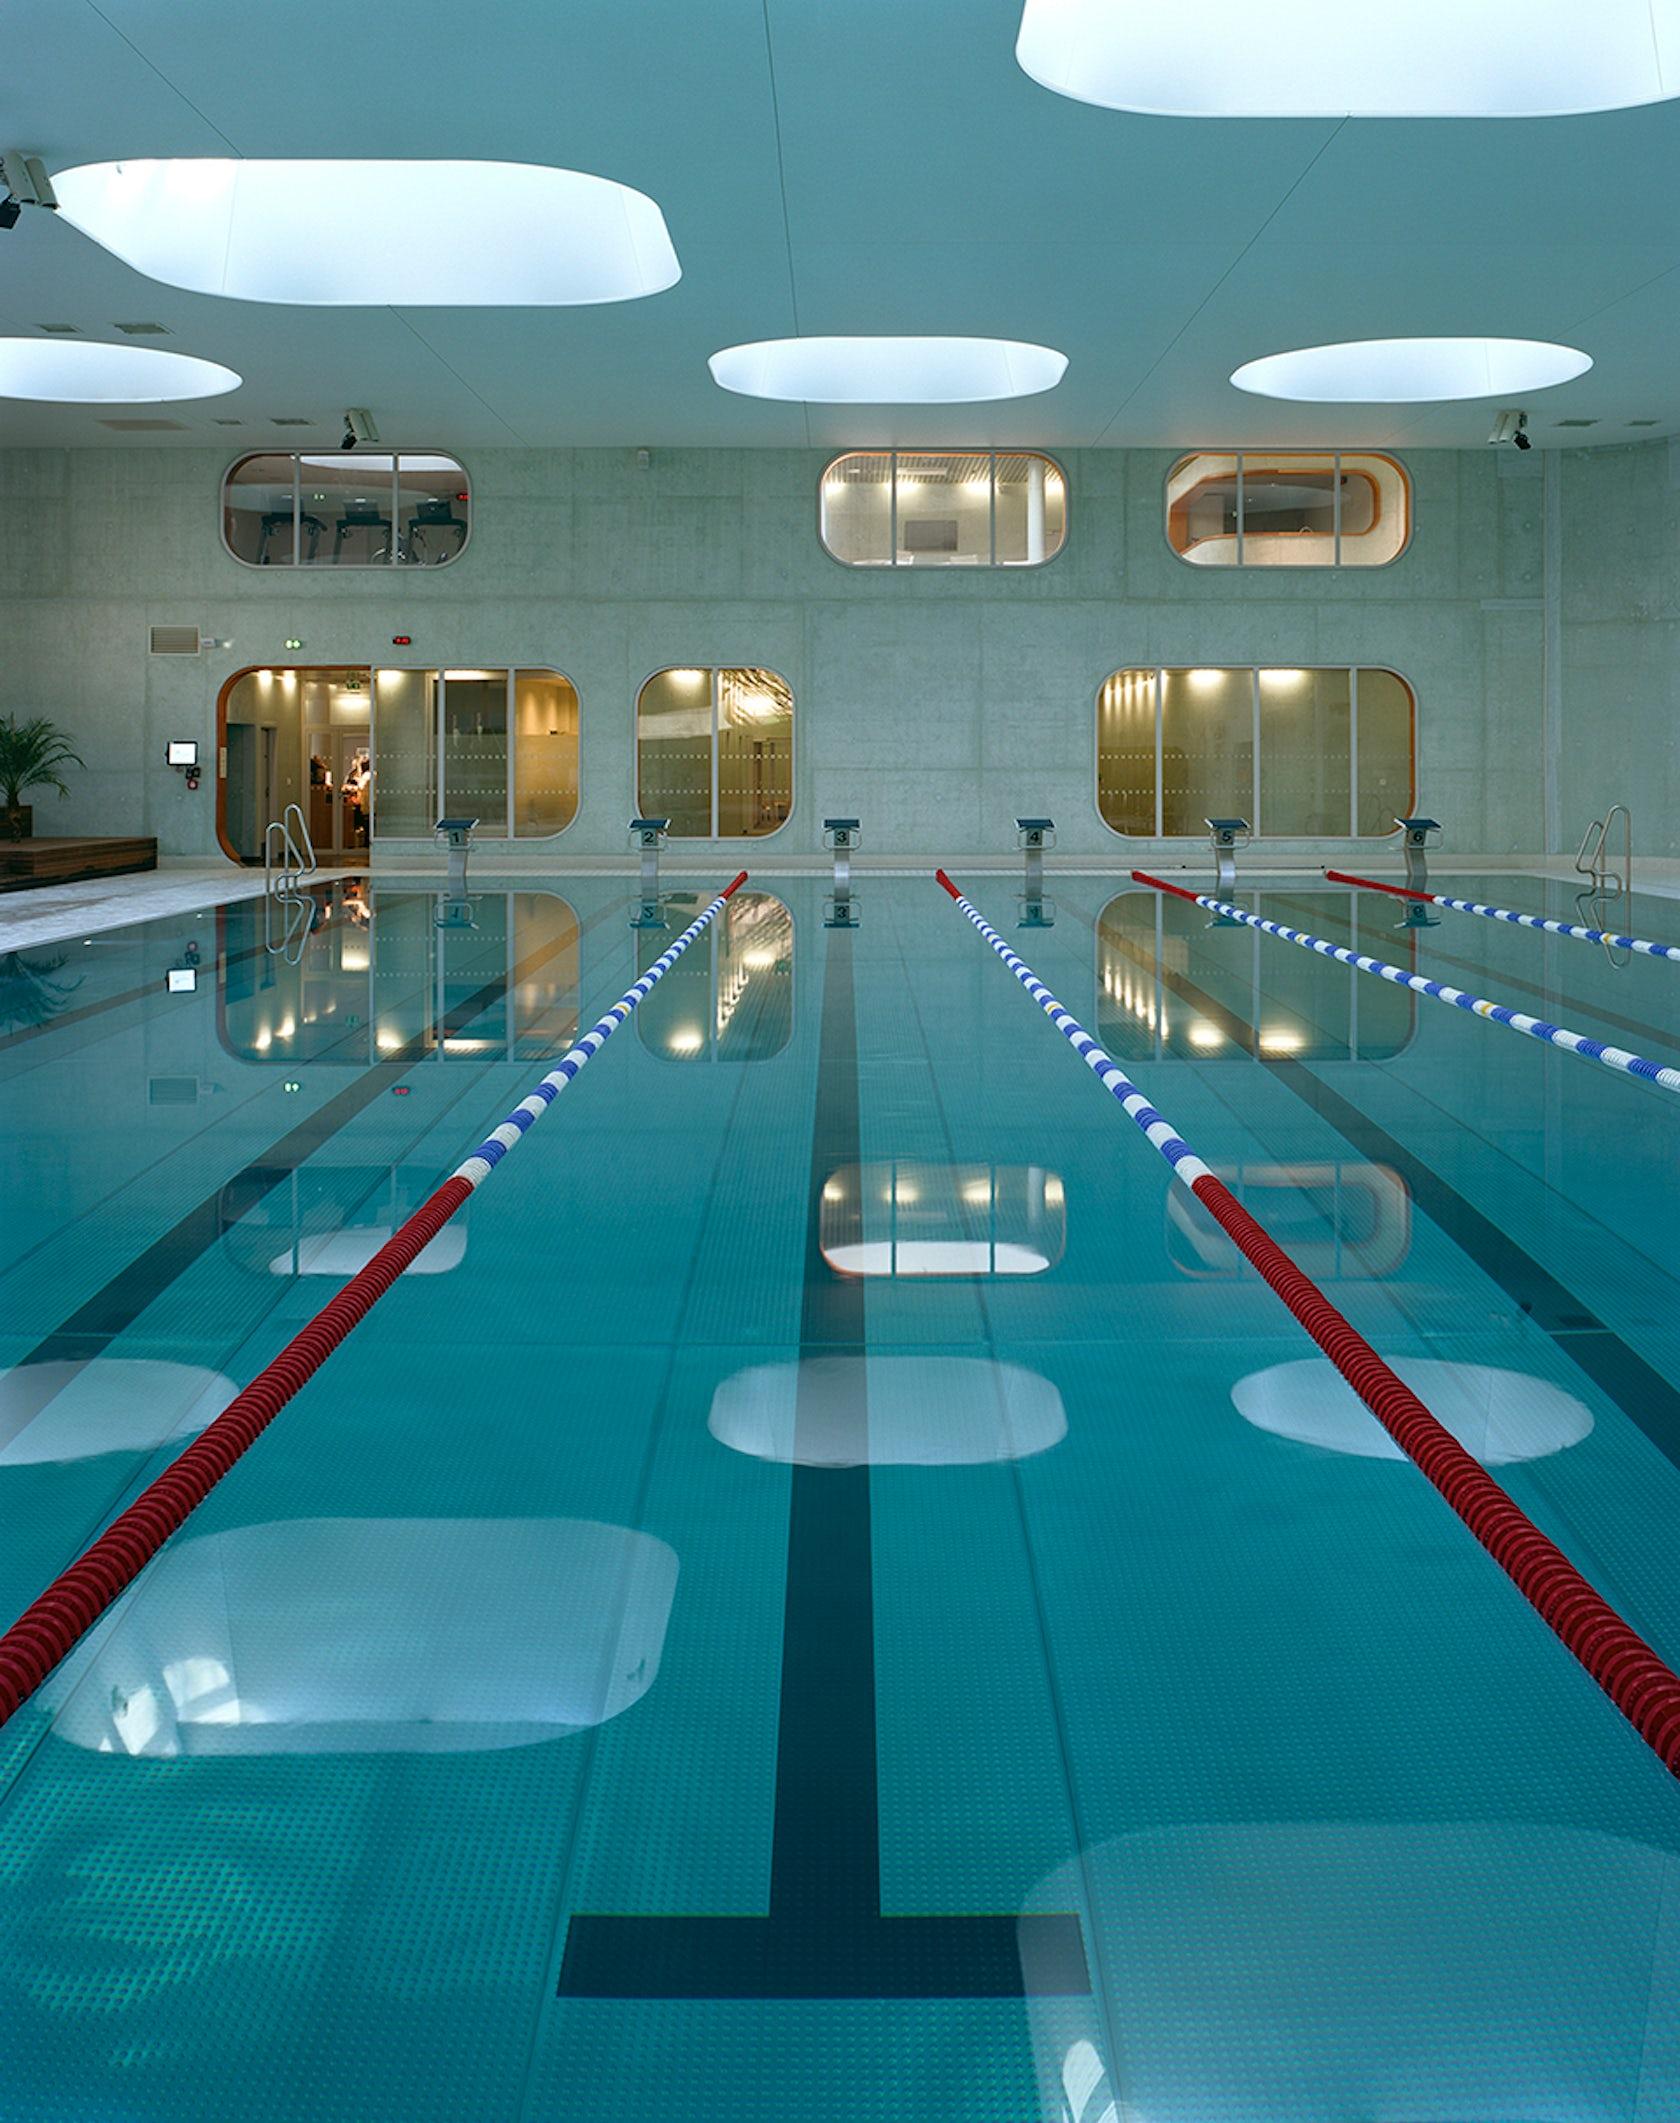 swimming pool feng shui architizer. Black Bedroom Furniture Sets. Home Design Ideas